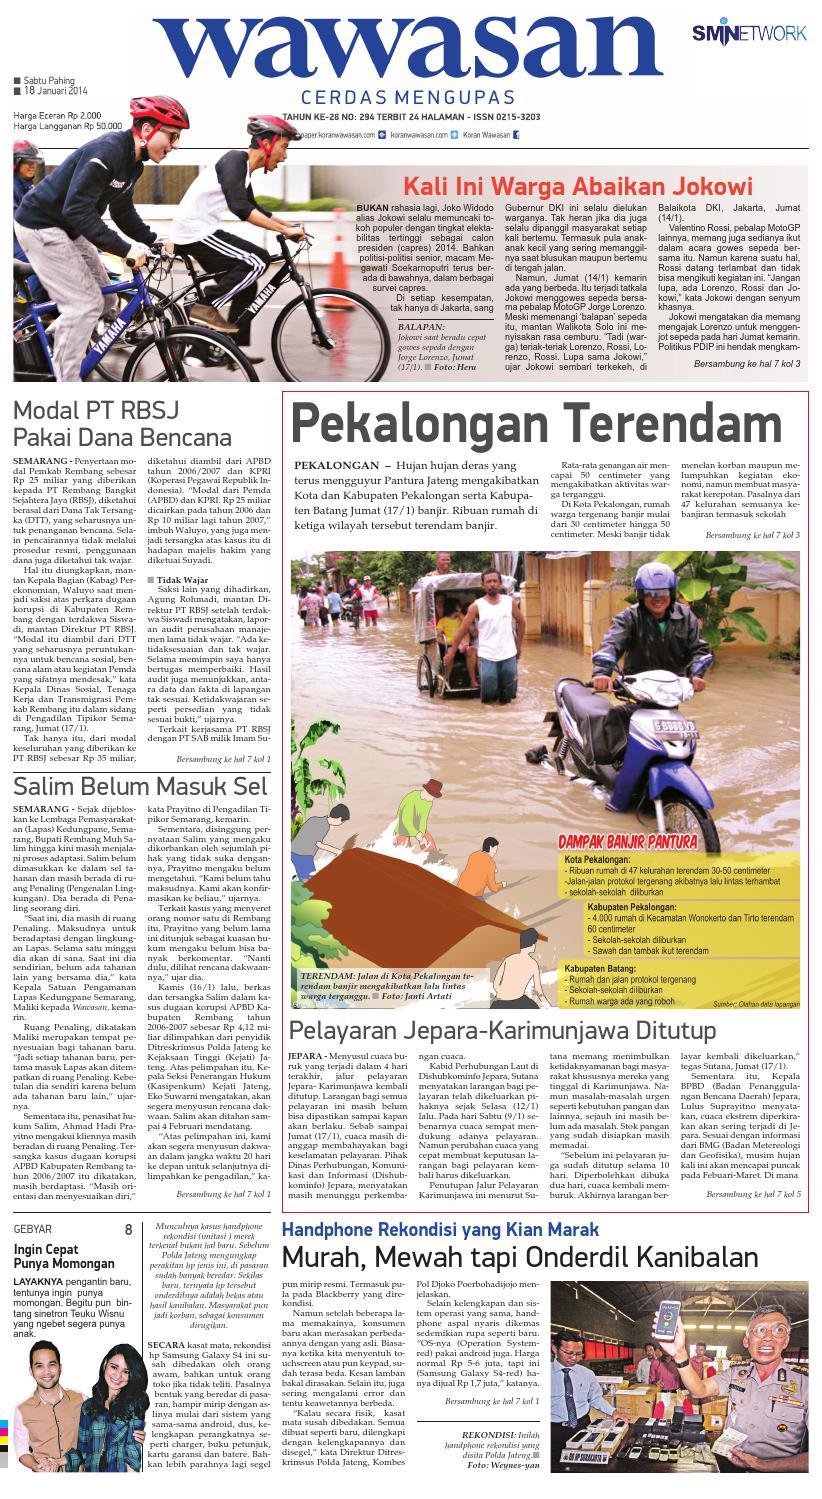 Wawasan 18 Januari 2014 By Koran Pagi Issuu Revo Fit Neo Green Karanganyar